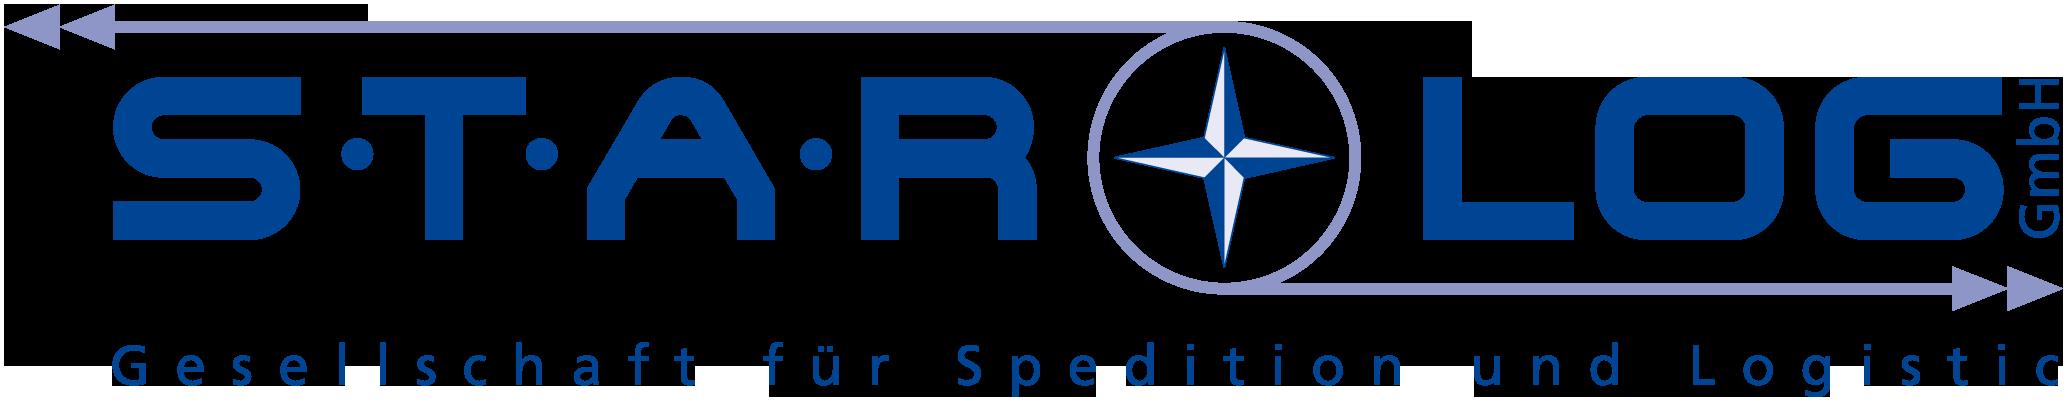 STAR LOG GmbH